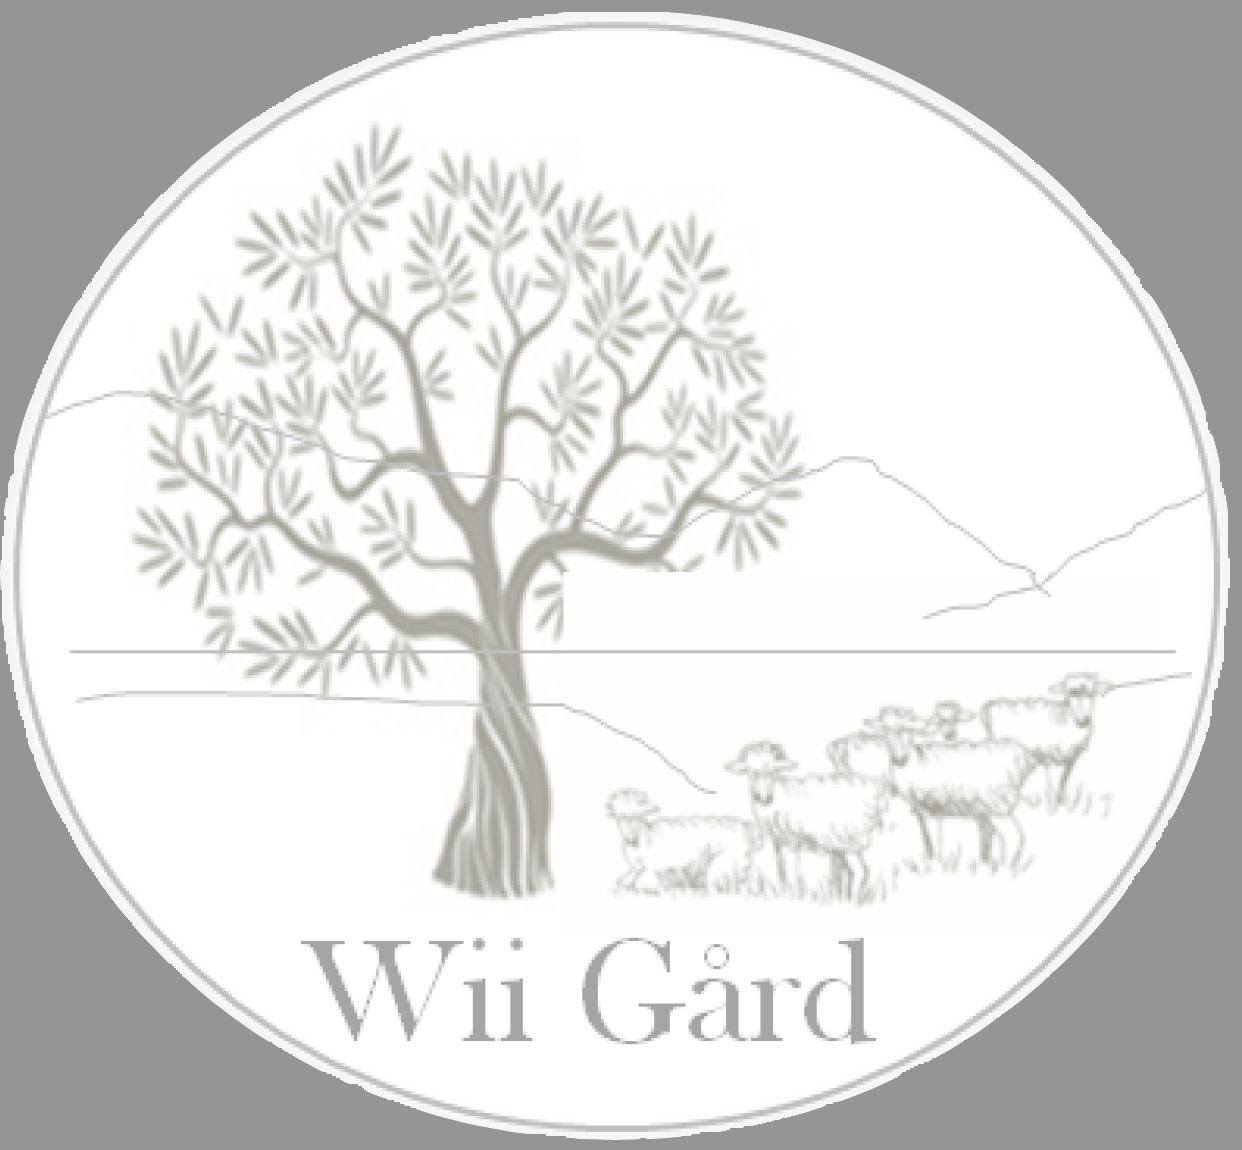 Wii Gård